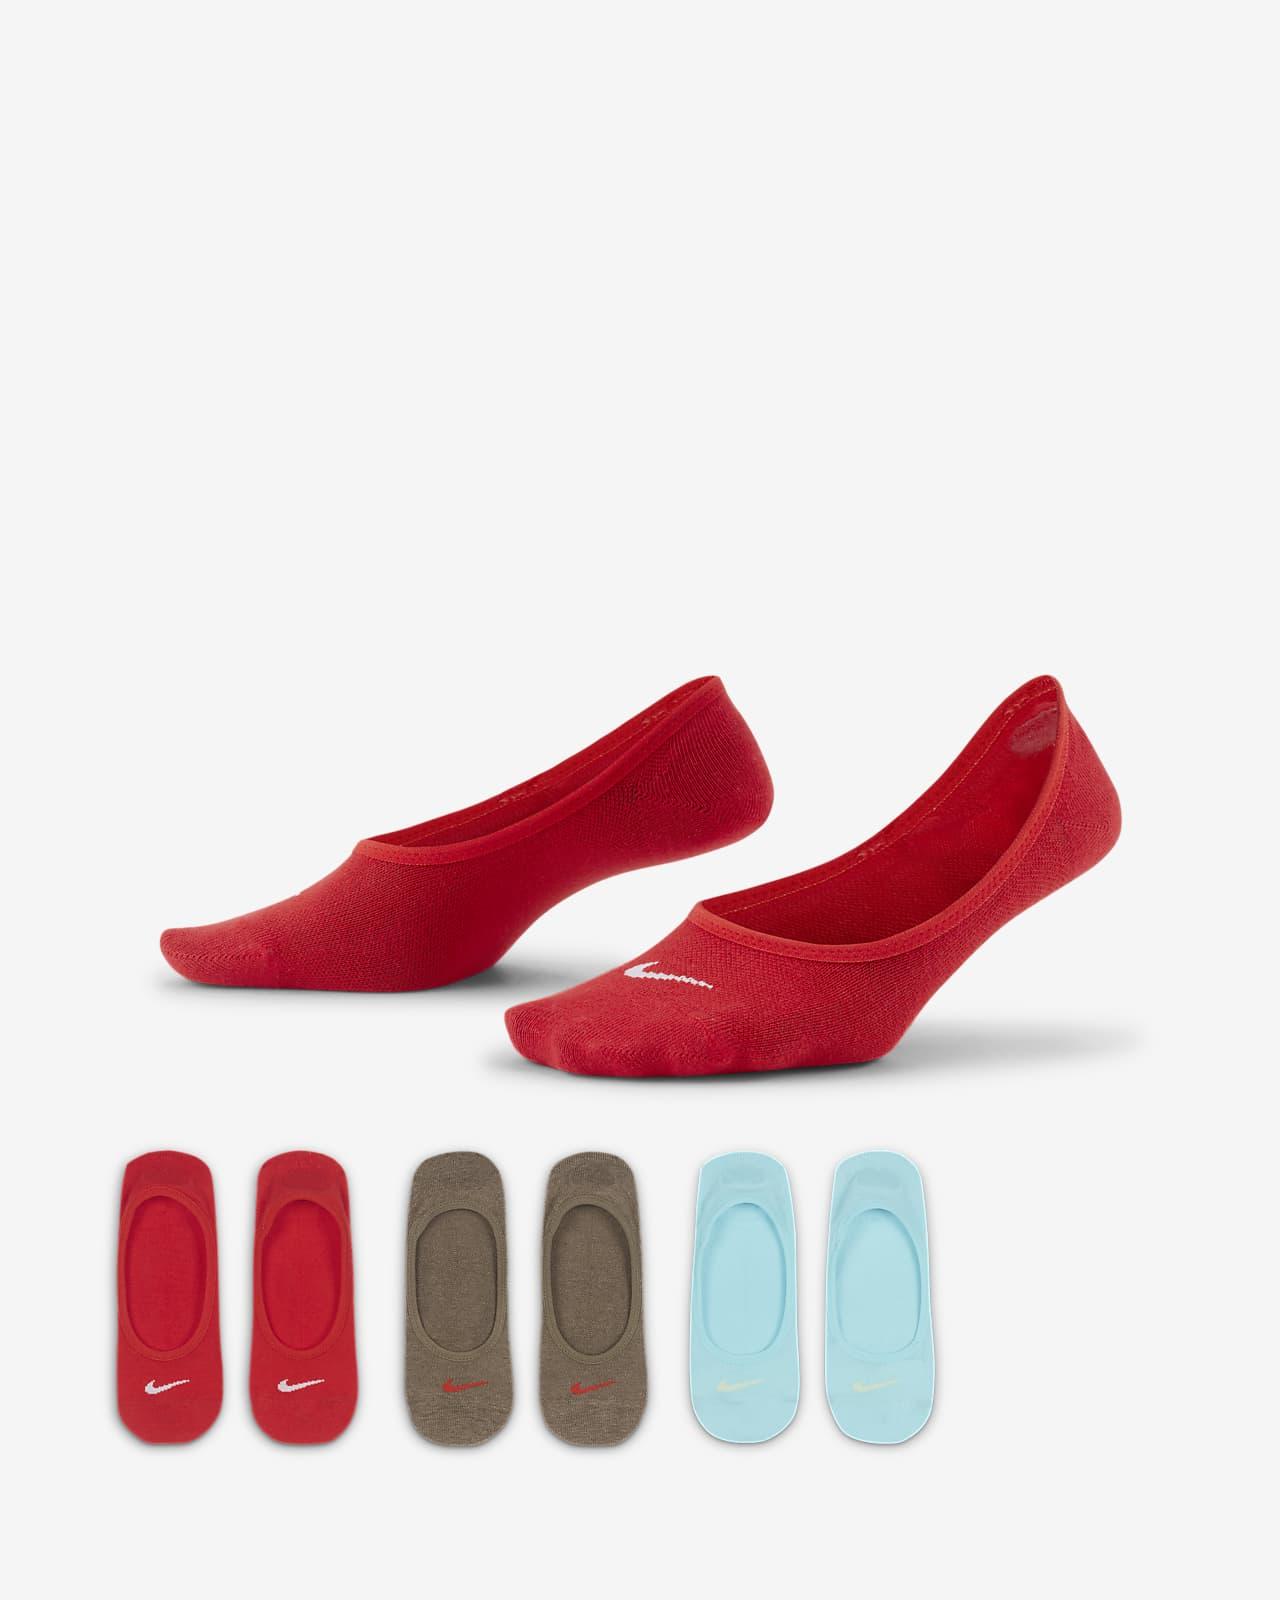 Calcetines invisibles de entrenamiento para mujer Nike Everyday Lightweight (3 pares)